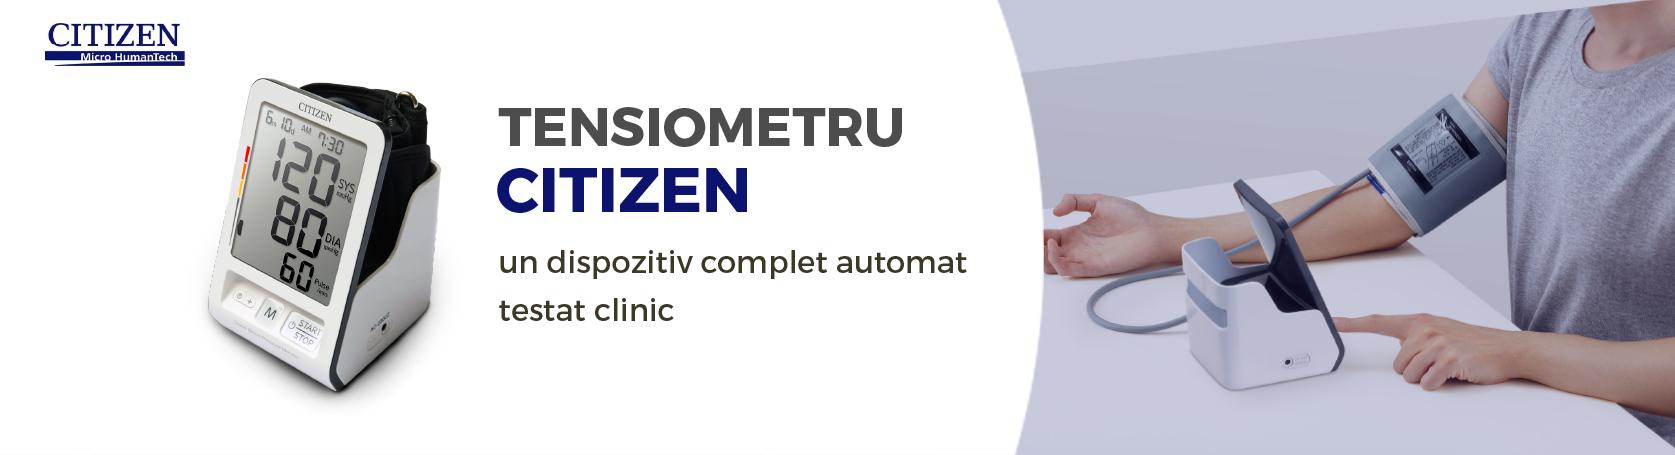 tensiometru citizen